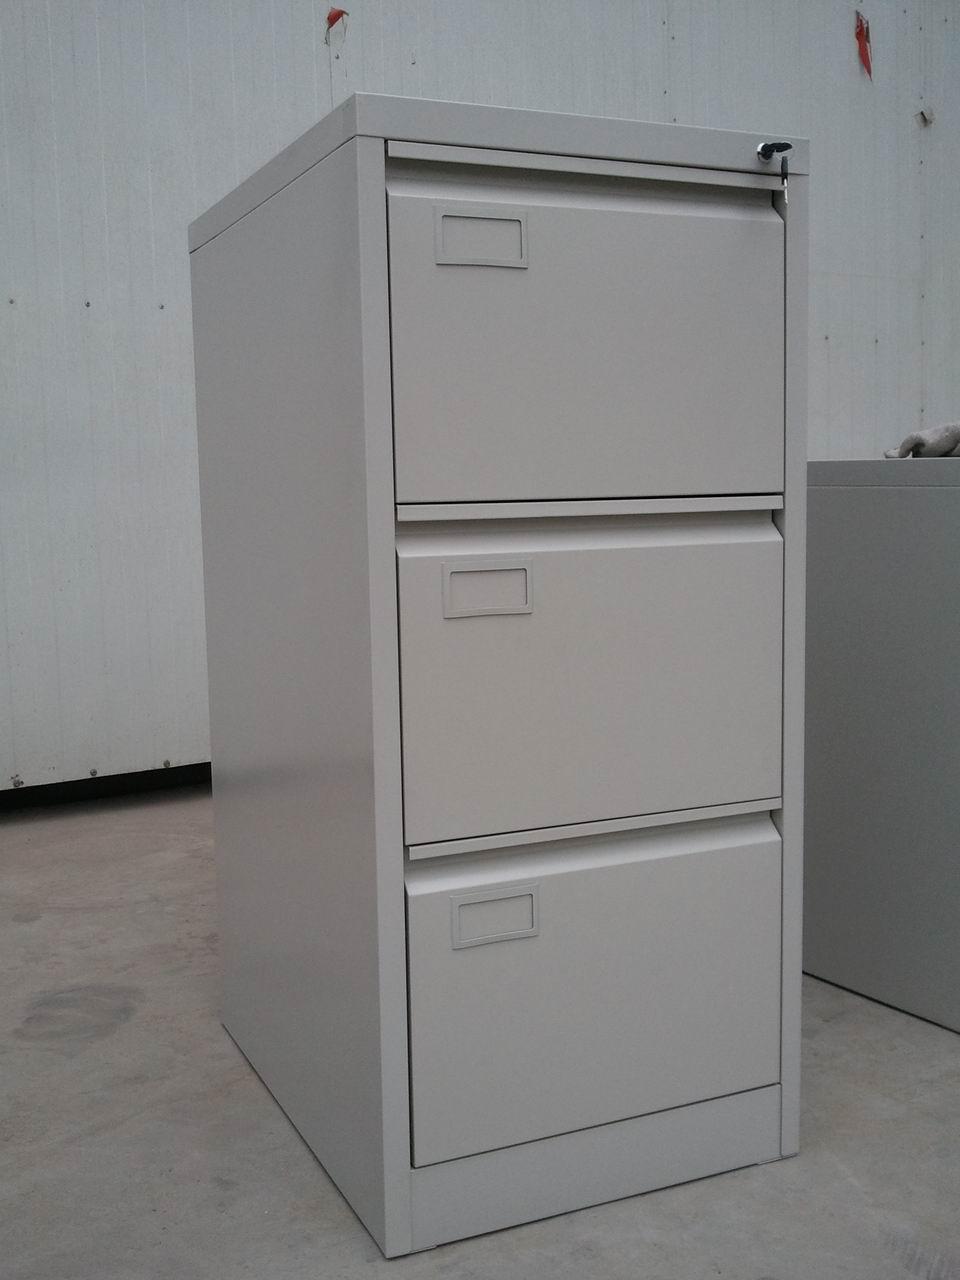 3 tiroir armoire de classement vertical autres meubles en for Meuble classement tiroir